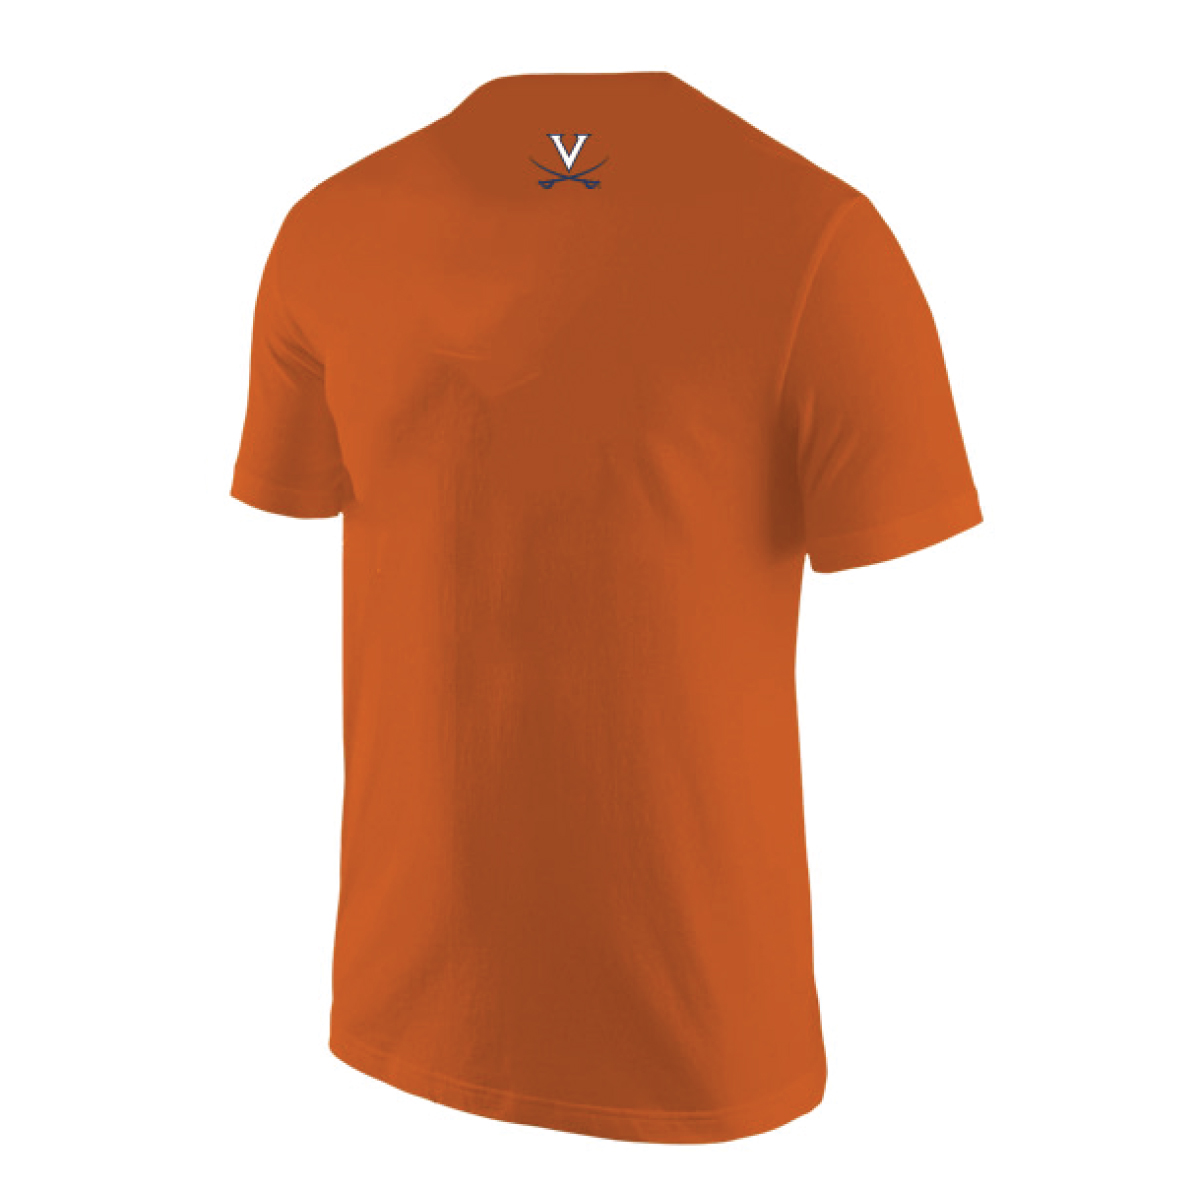 University of Virginia Football The New Standard Arch T-shirt